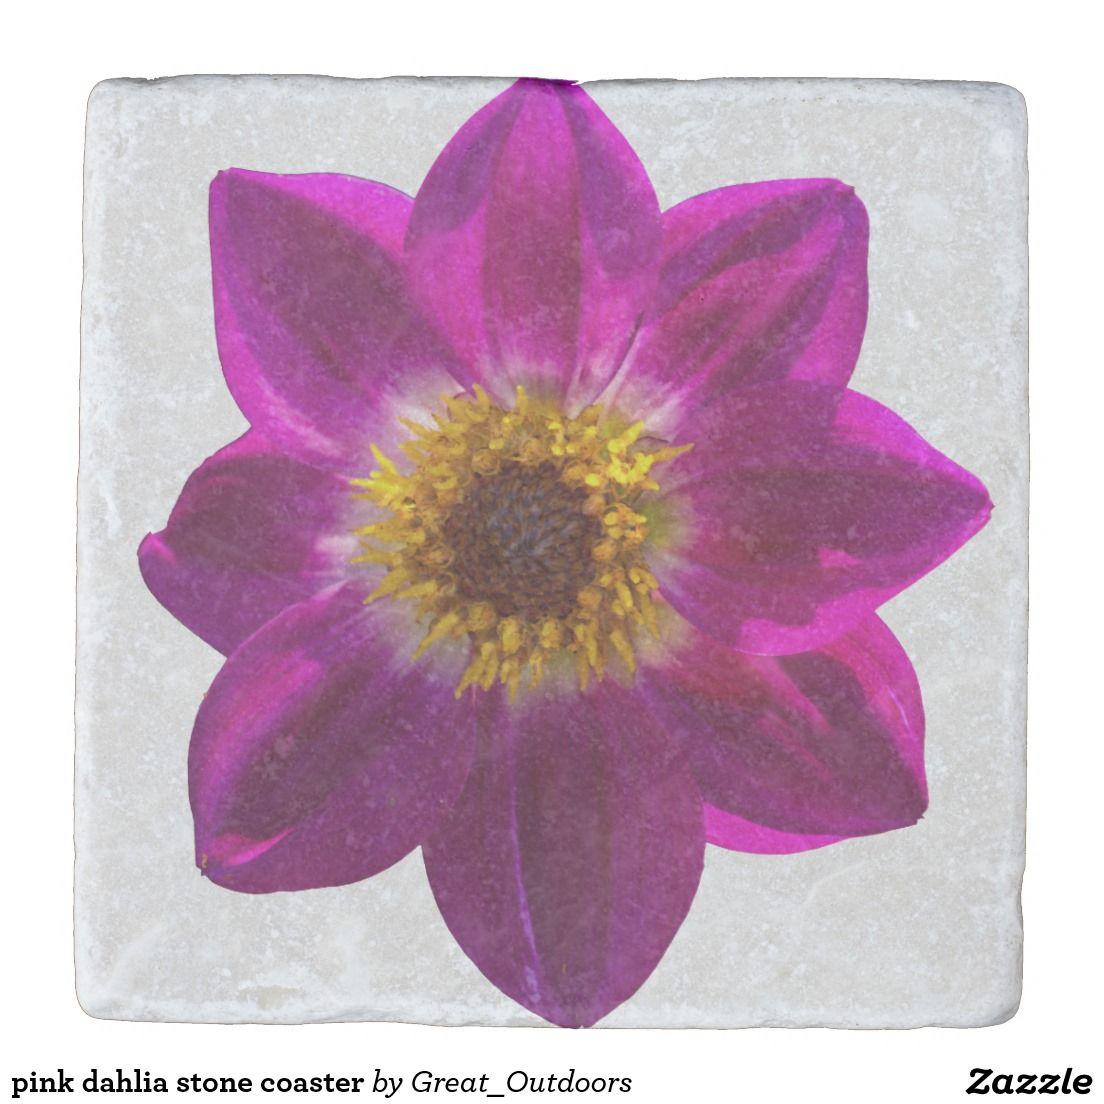 pink dahlia stone coaster